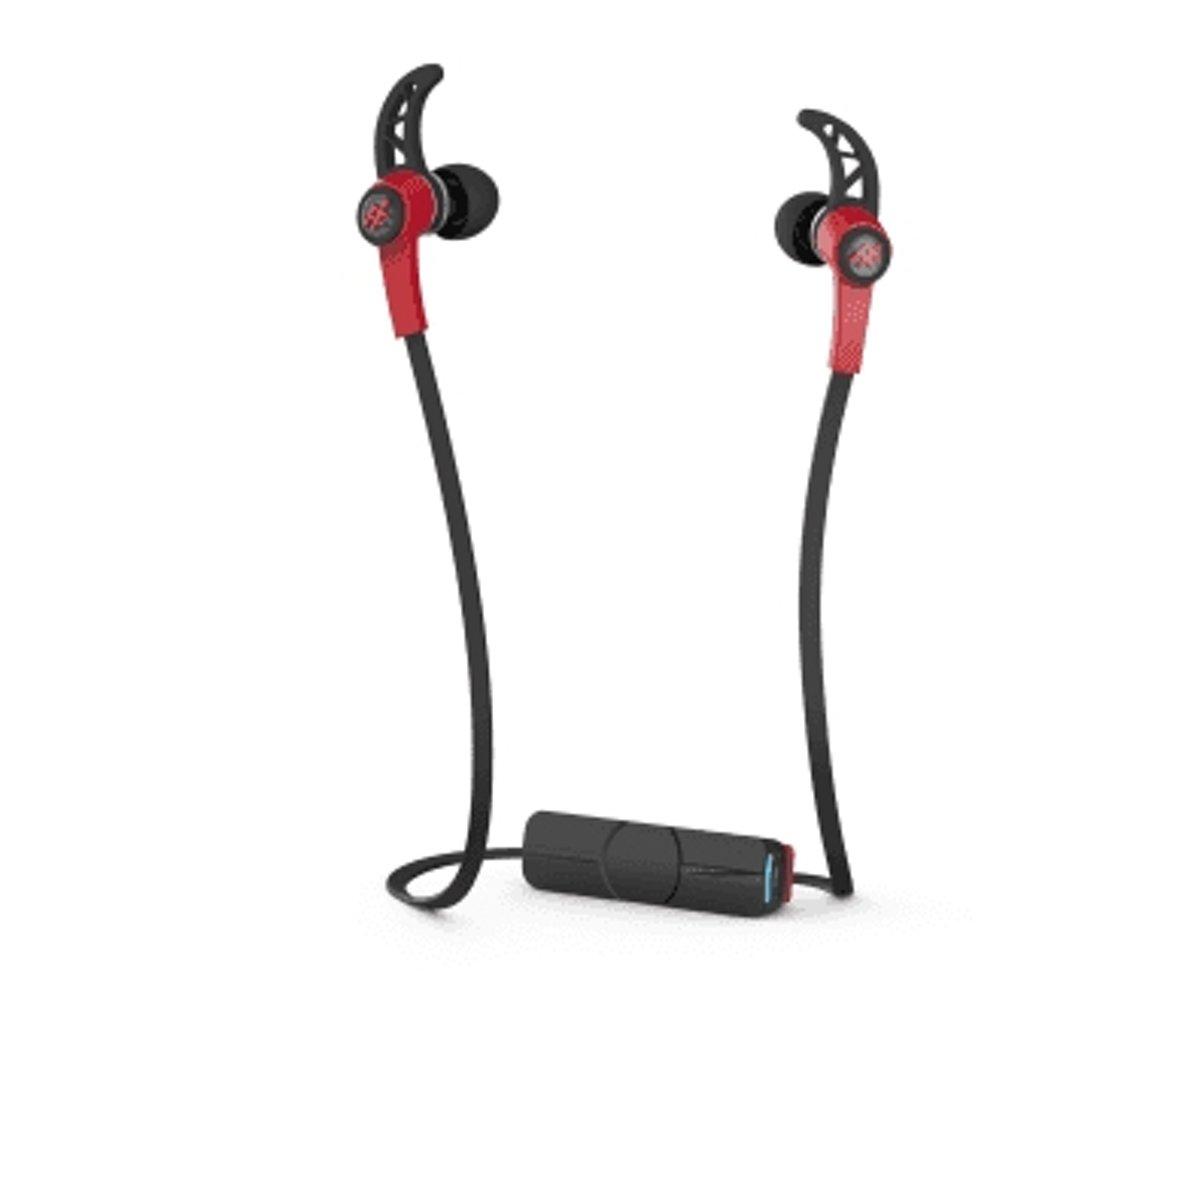 IFROGZ Bluetooth Audio Summit Wireless Oordopjes Rood kopen